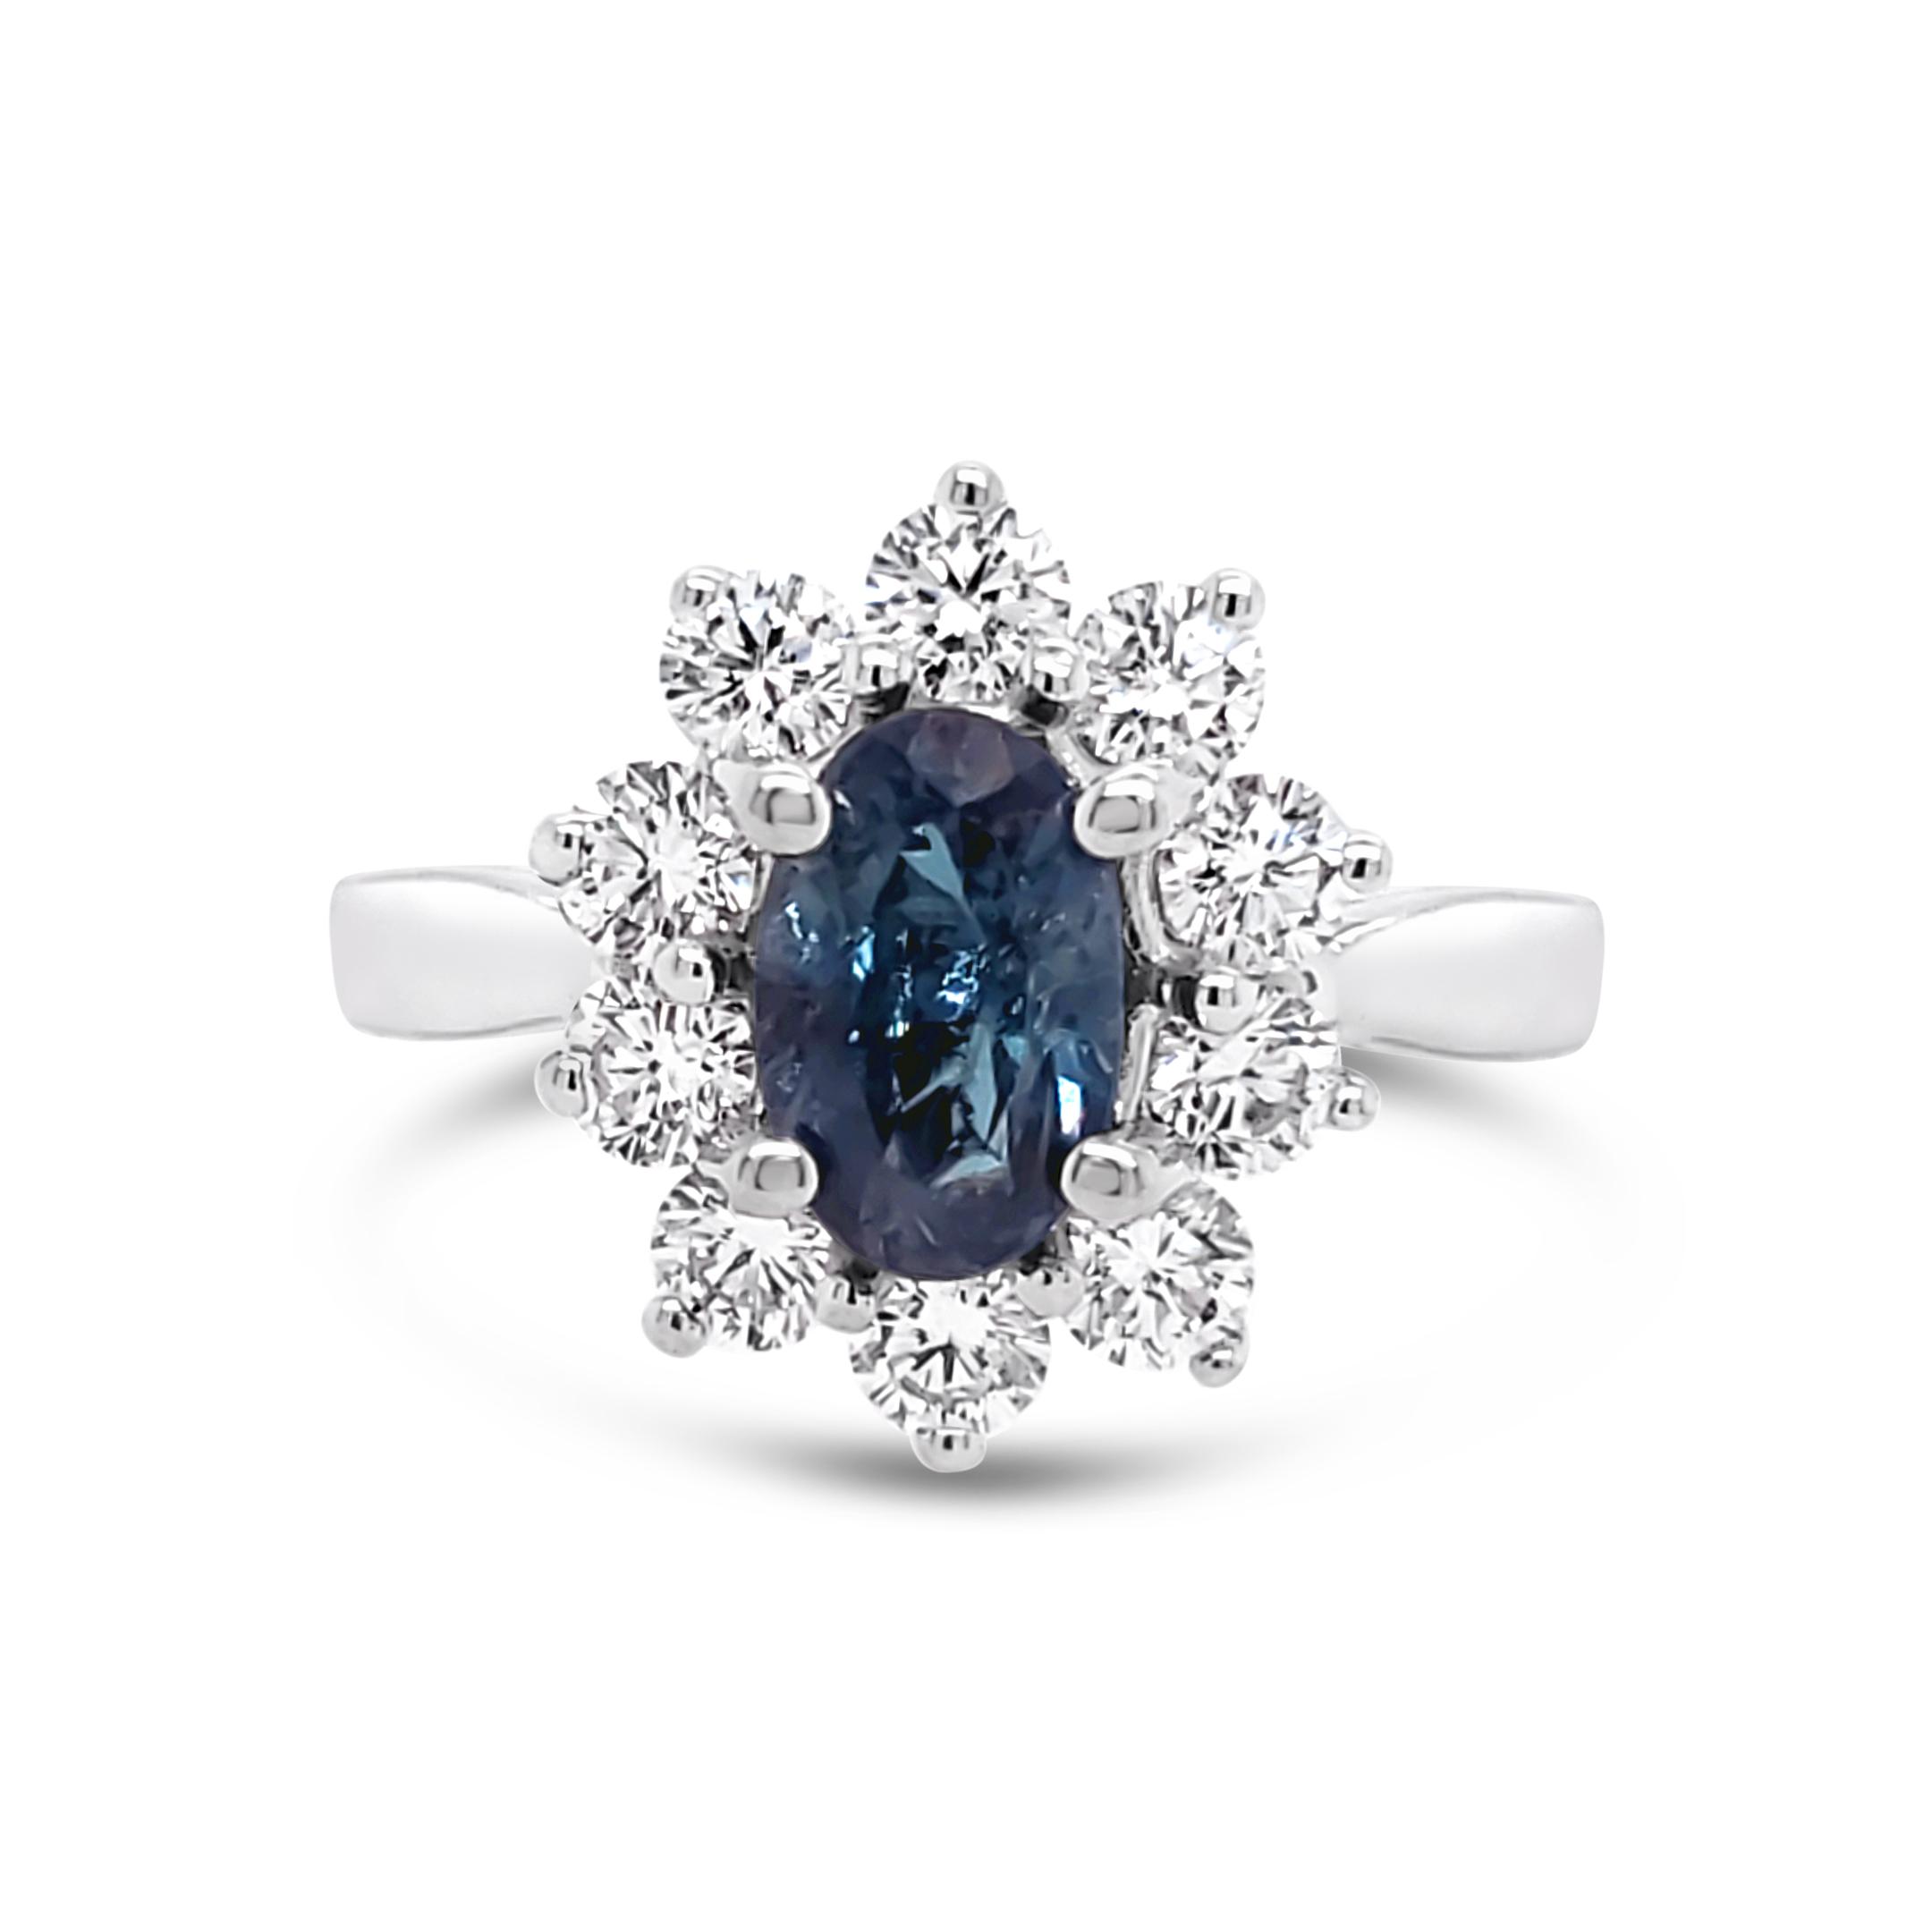 ALEXANDRITE AND DIAMOND RING  ENGAGEMENT RING DESIGN